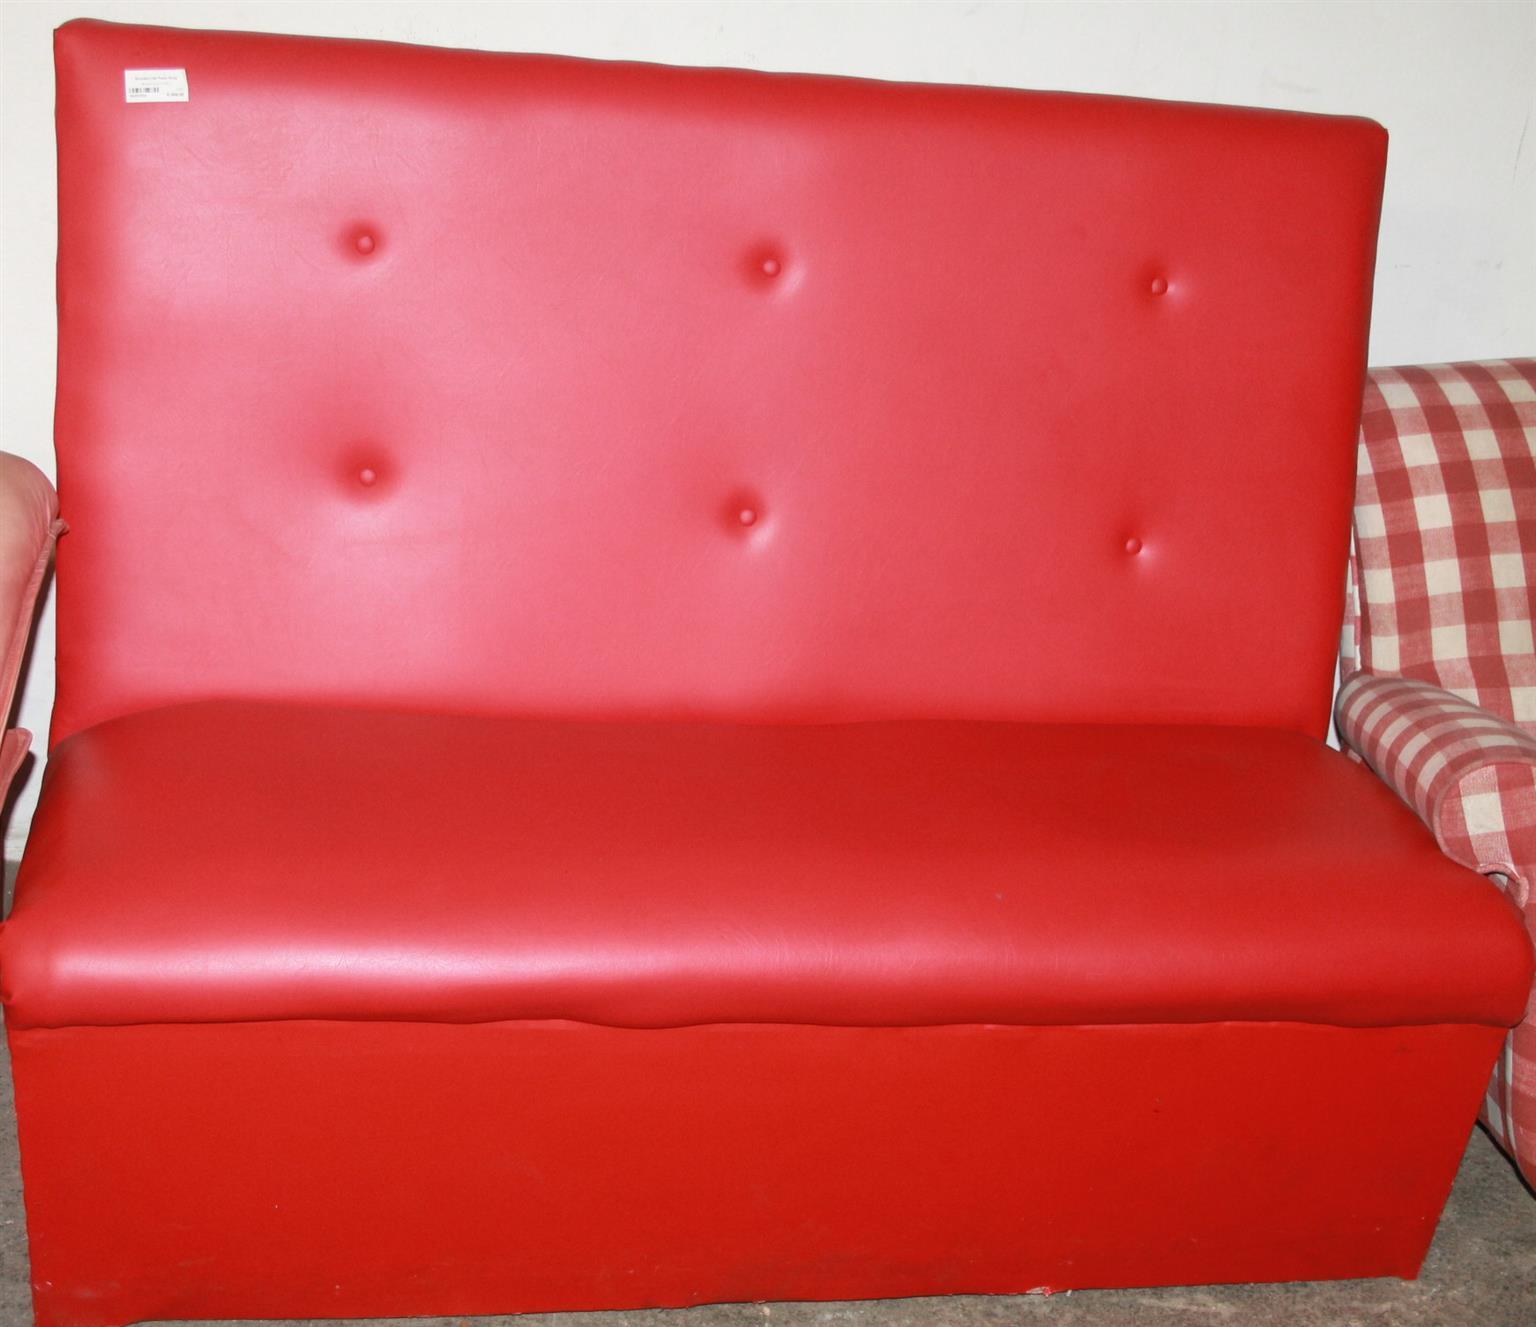 Bench couch S026182a #Rosettenvillepawnshop